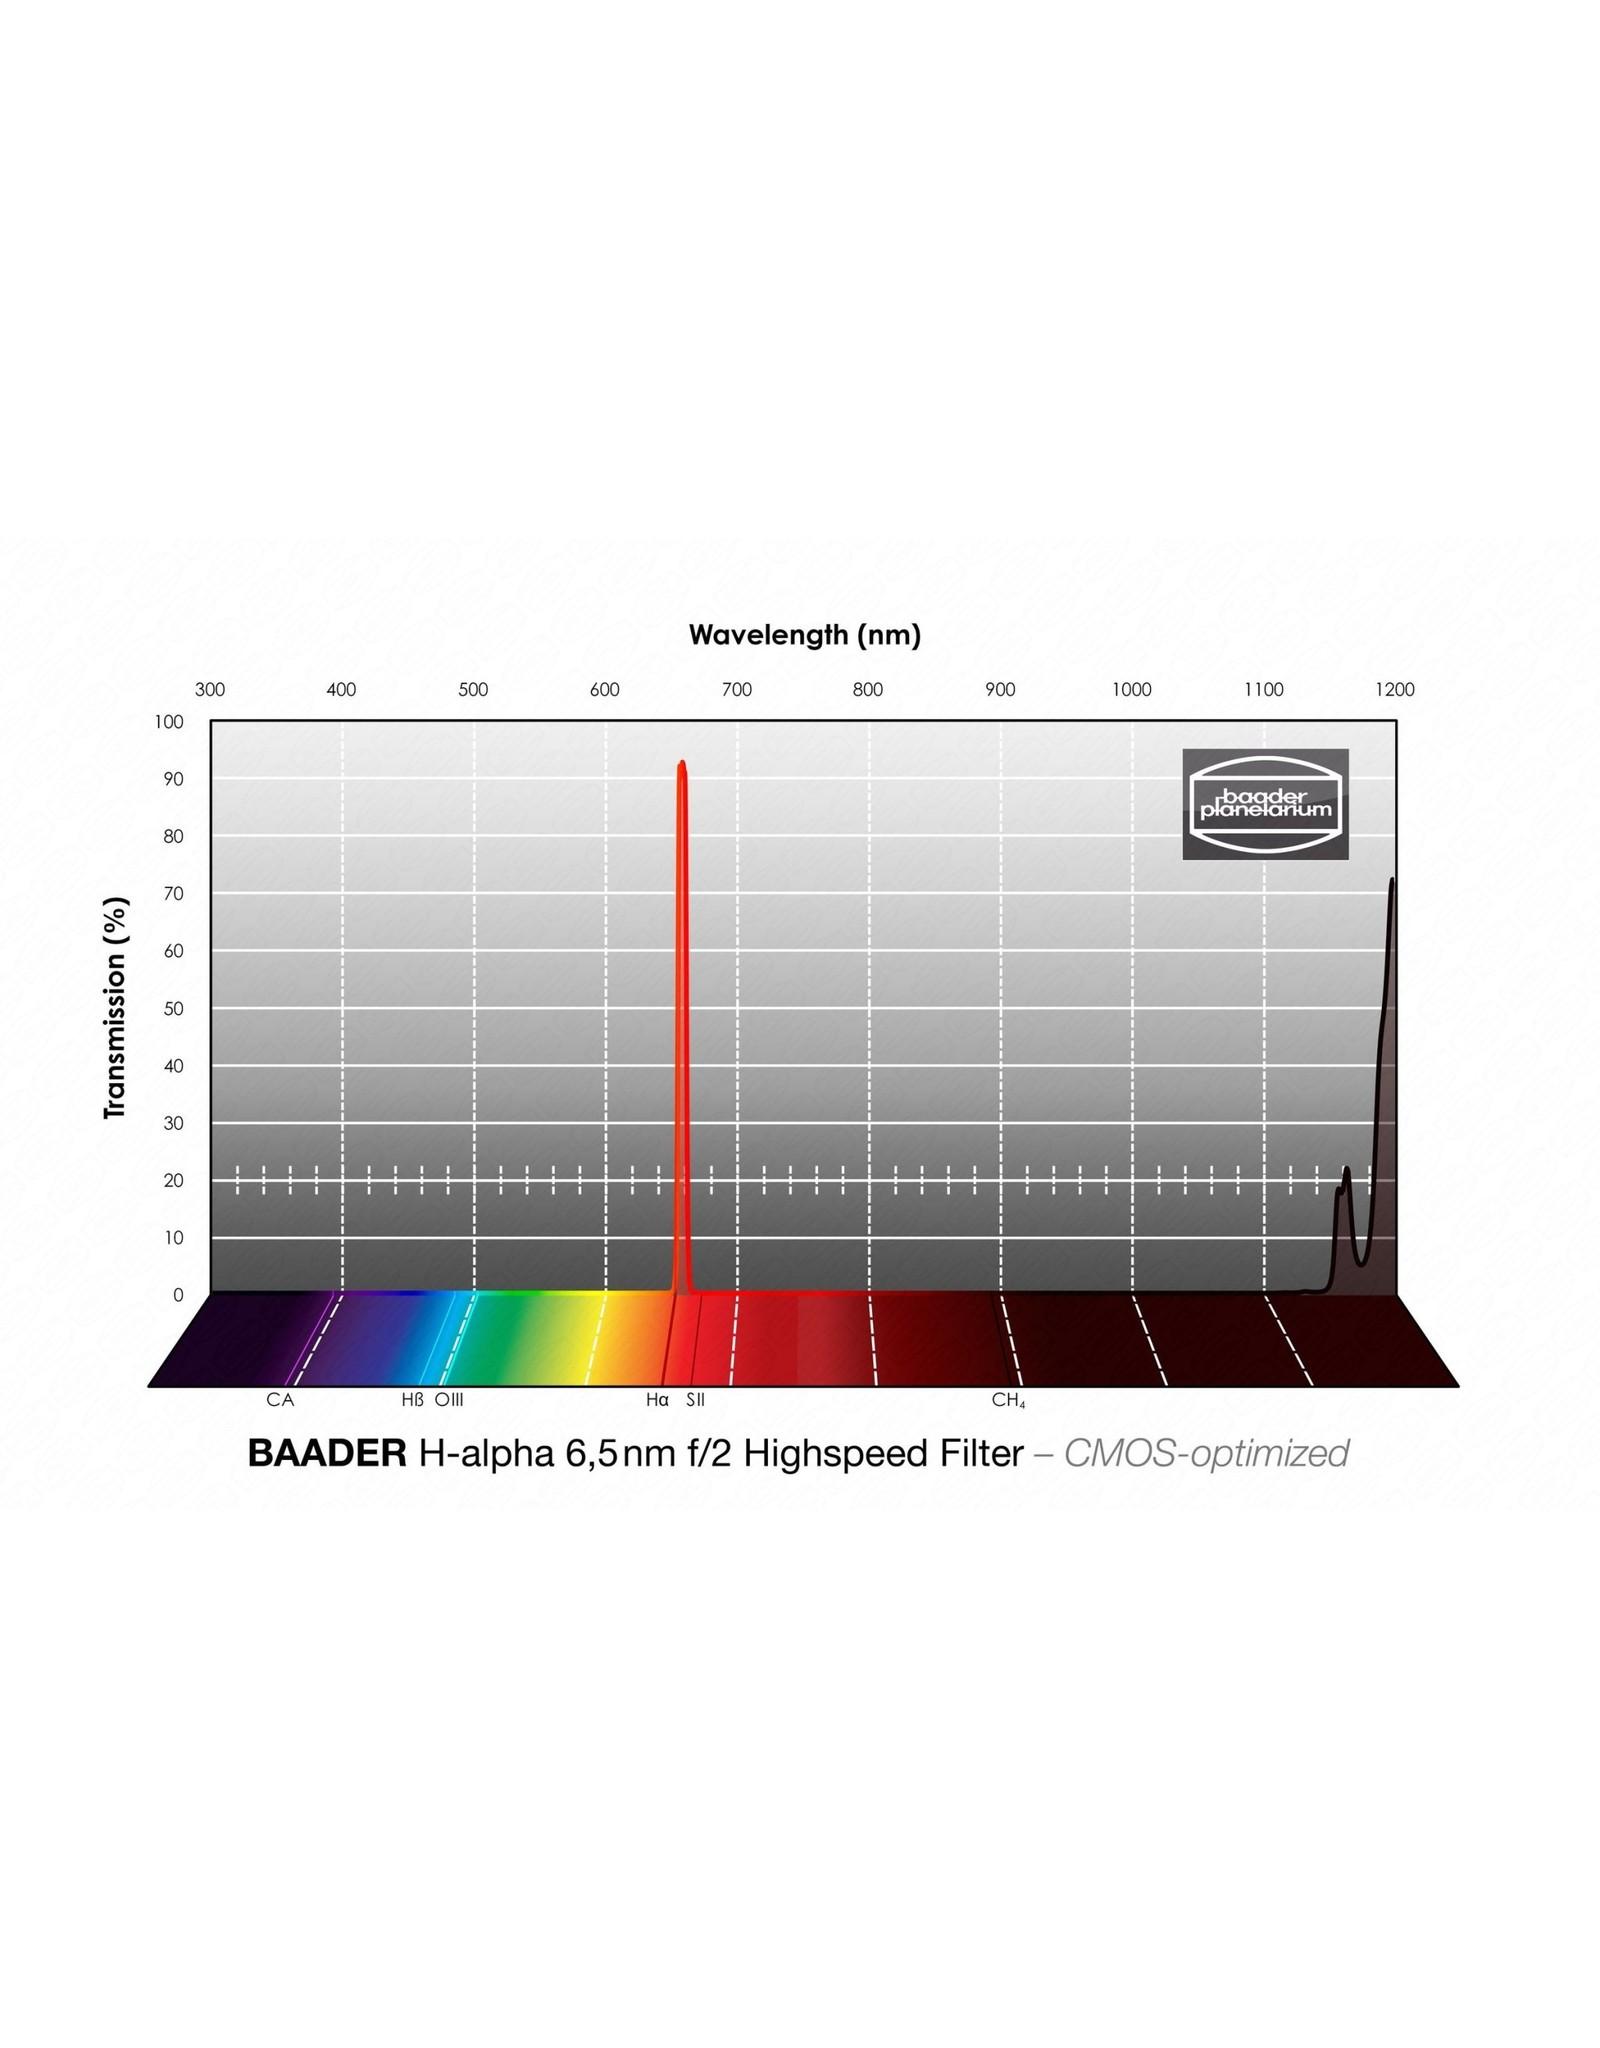 Baader Planetarium Baader 6.5nm Narrowband Filter set – CMOS-optimized - H-alpha, O-III, S-11 (Specify Size)